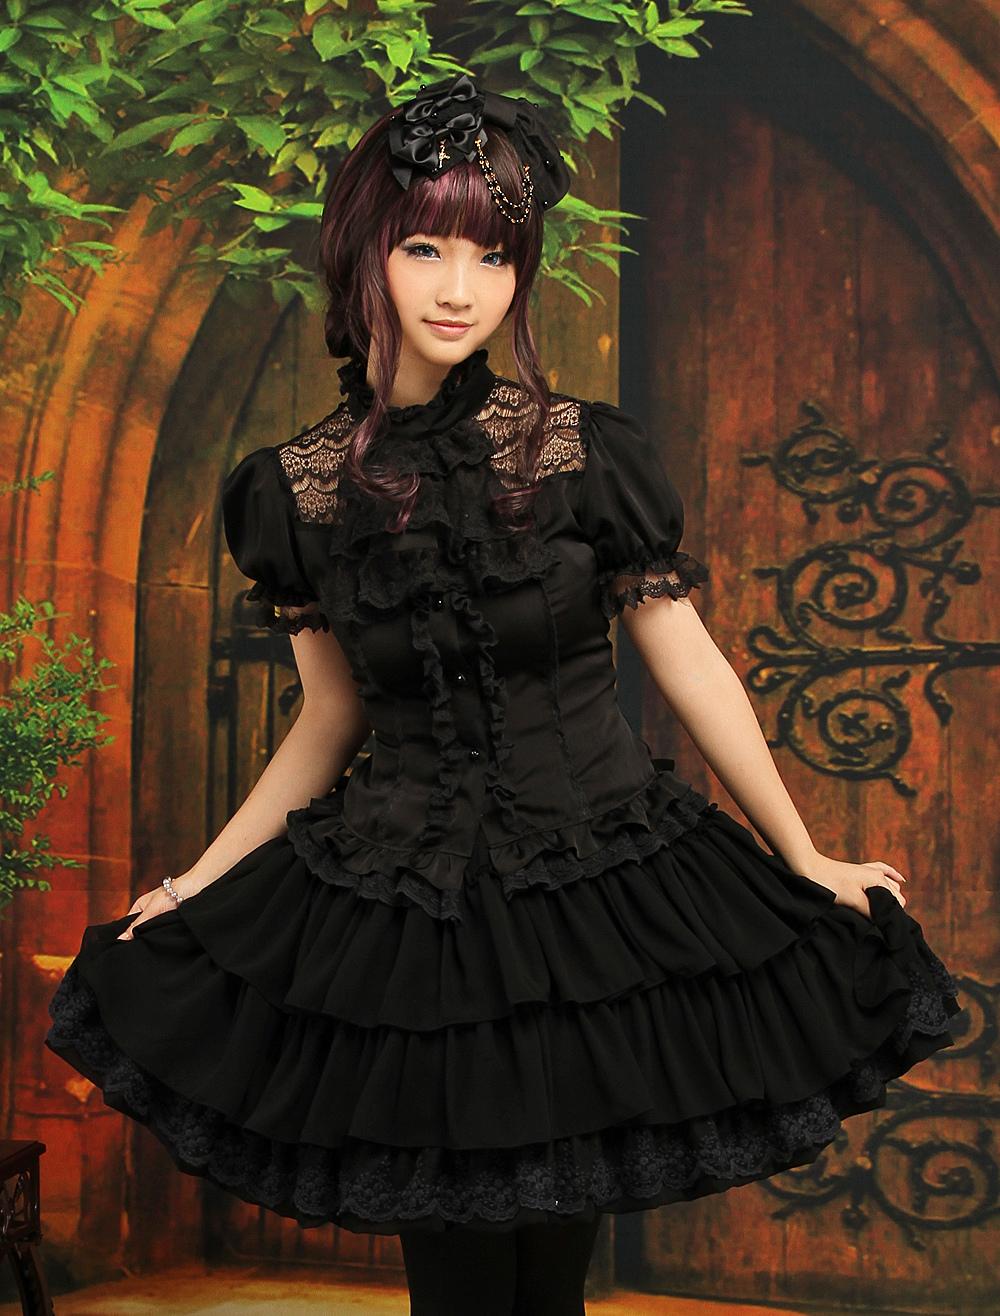 Gothic Black Layered Elastic Satin Chiffon Lolita Outfits